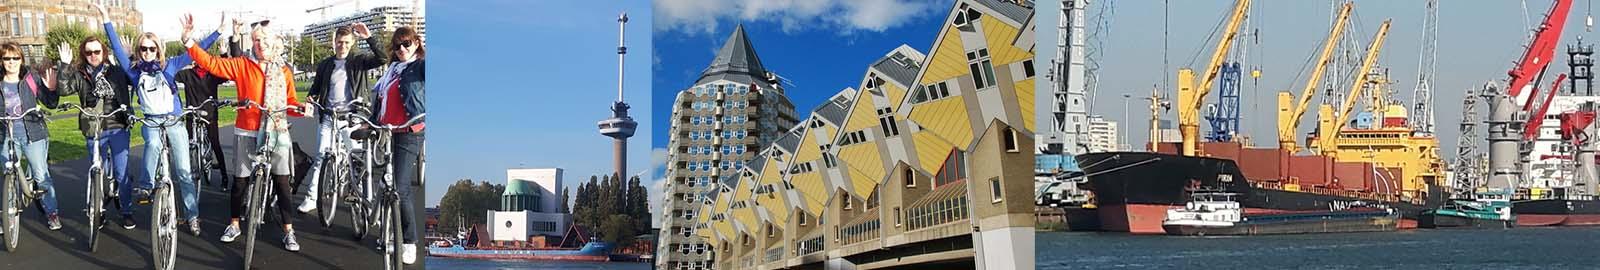 Rotterdam Stadstour